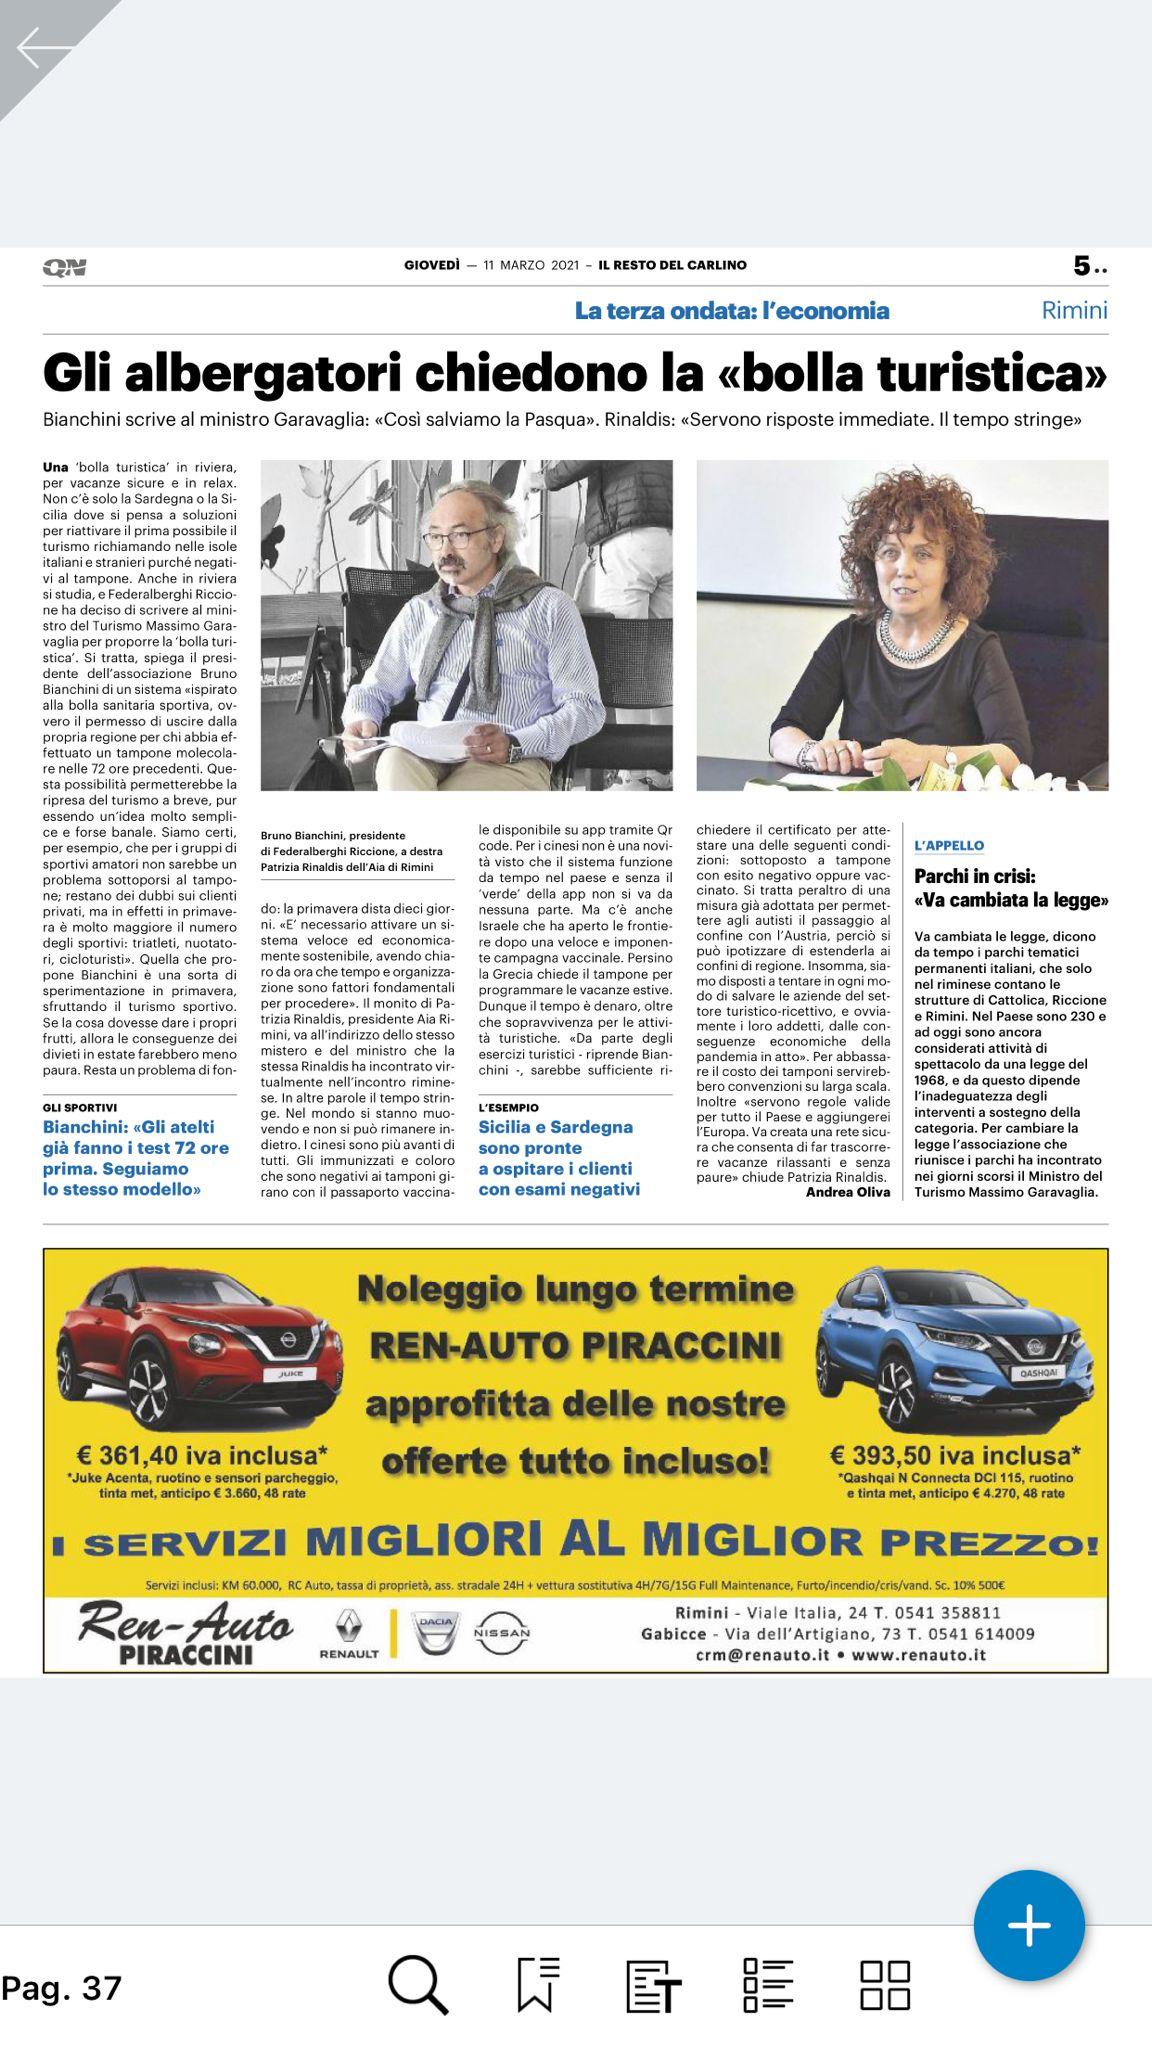 Aiatamp2 Riccione Offerta Clienti Affezionati